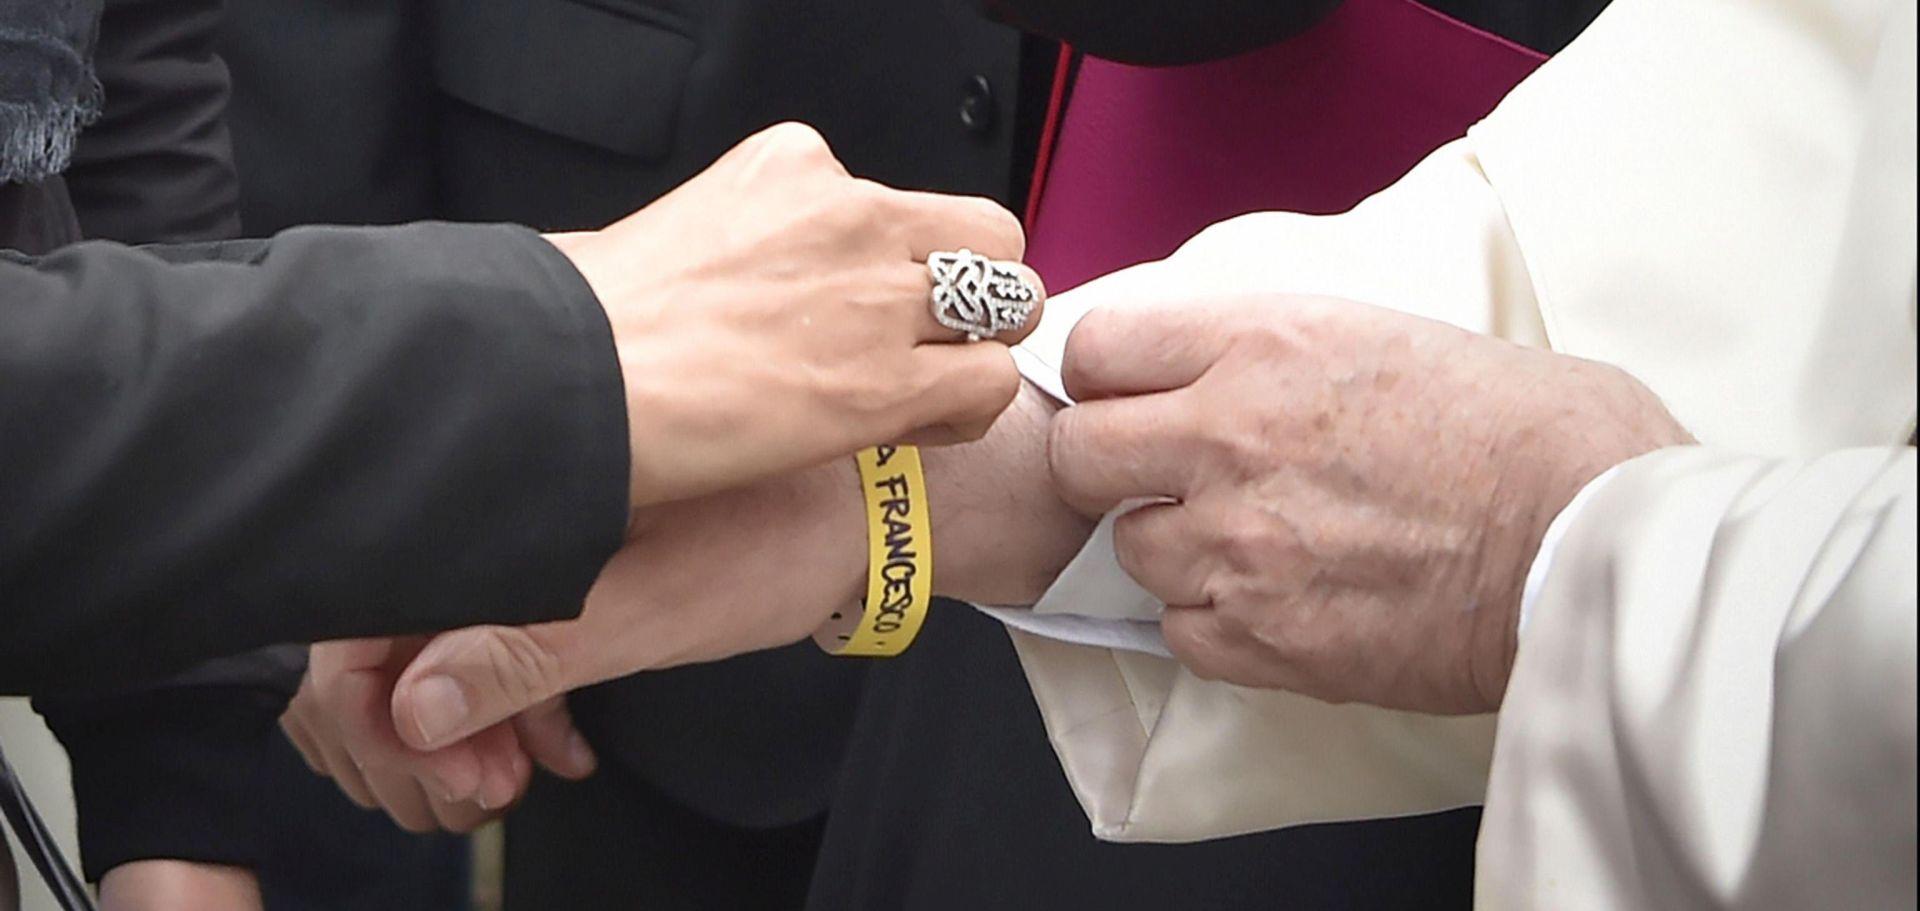 Papa Franjo nosio identifikacijsku narukvicu kako bi senzibilizrao javnost za položaj migranata